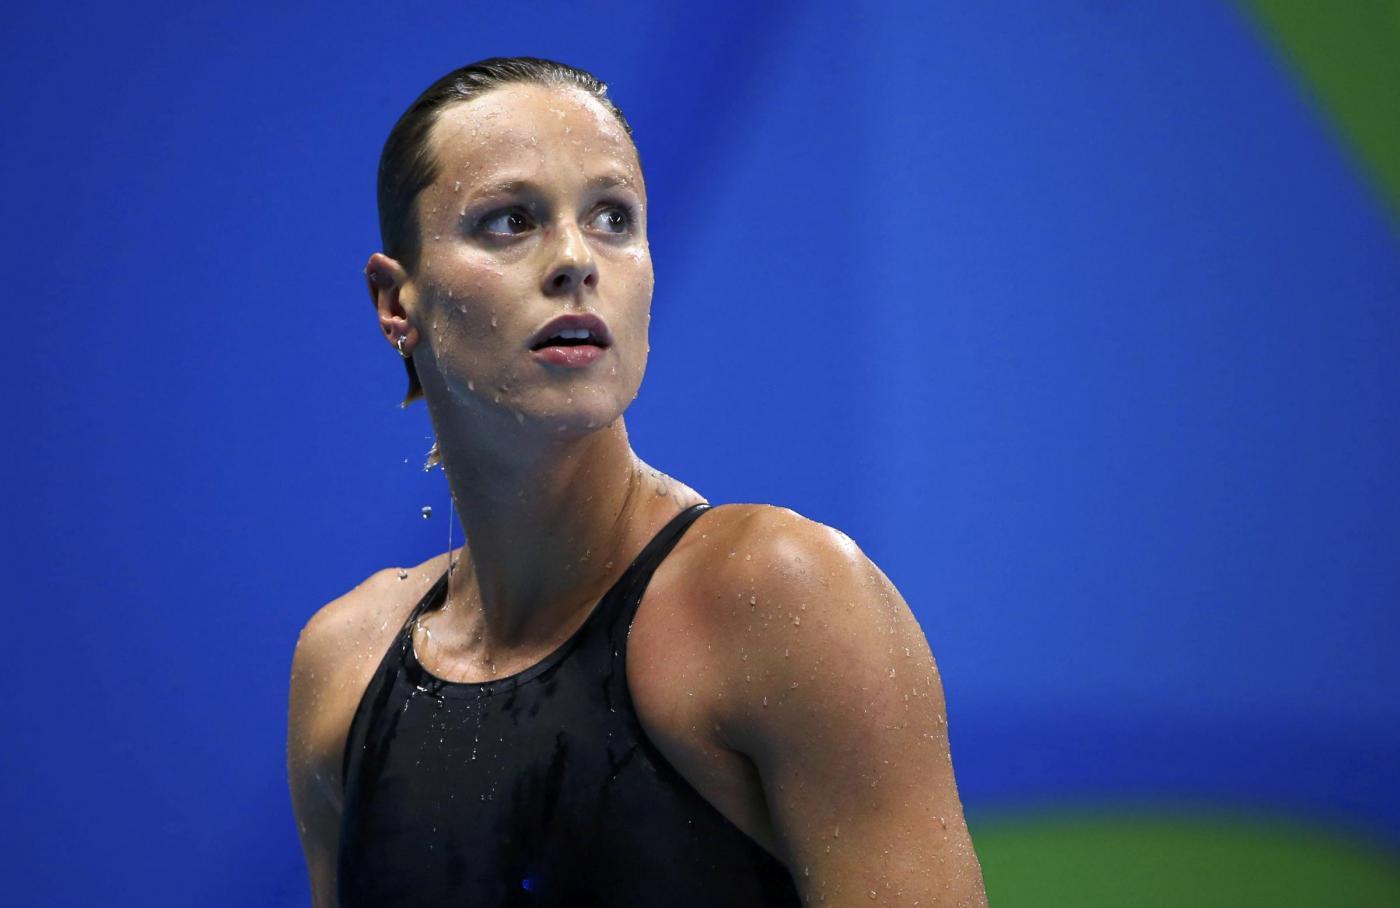 Olimpiadi 2016: Federica Pellegrini chiude quarta i 200 stile libero, vince Ledecky